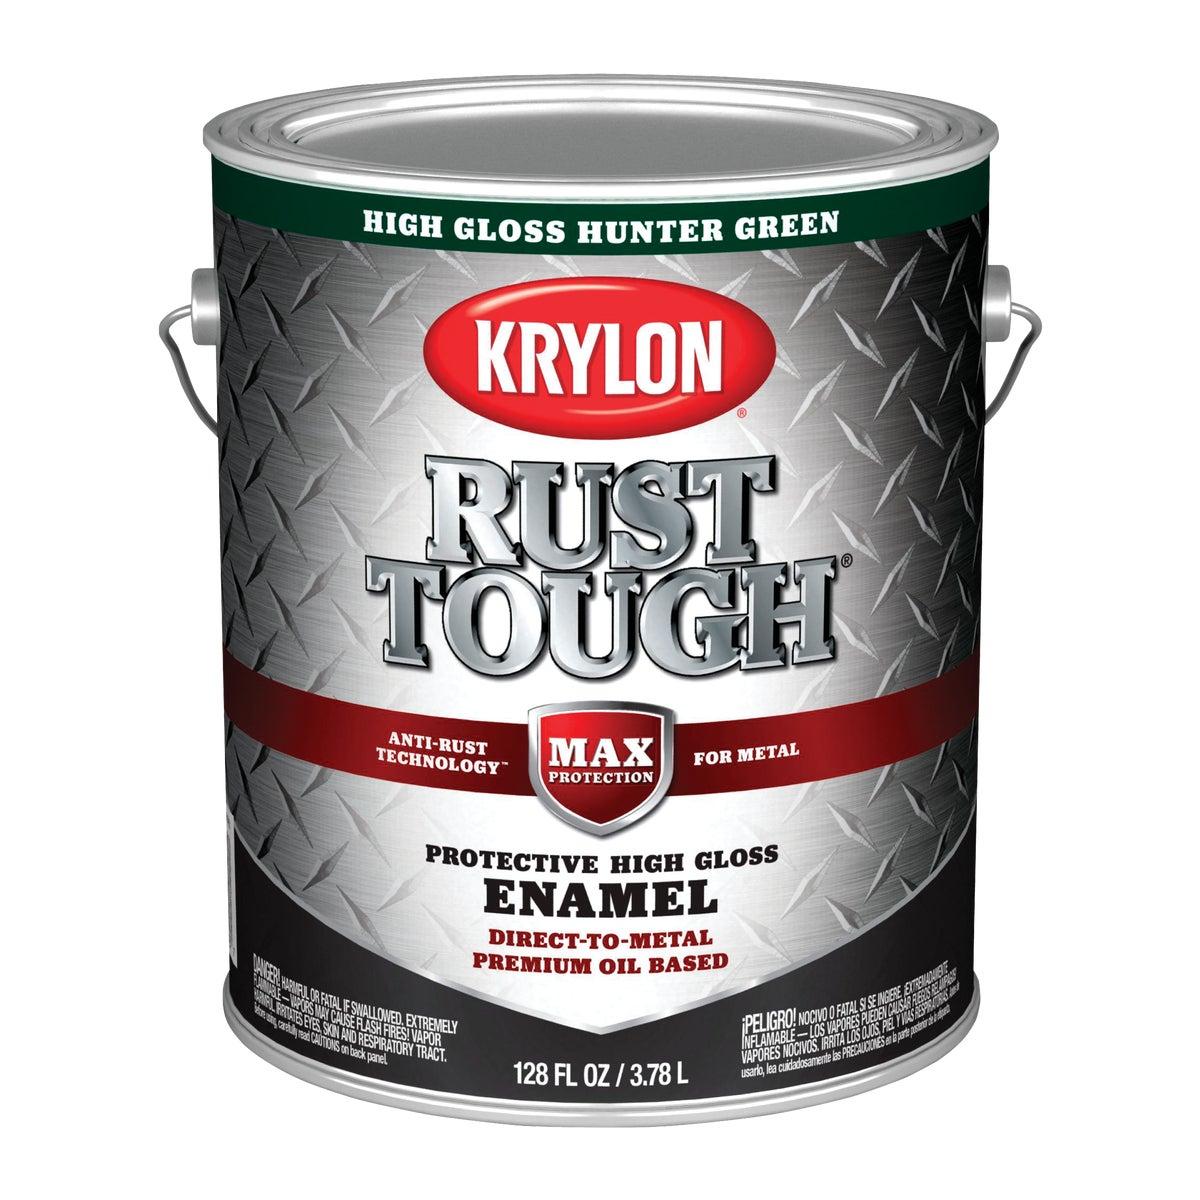 GLS HNTR GRN RUST ENAMEL - 044.0021844.007 by Valspar Corp